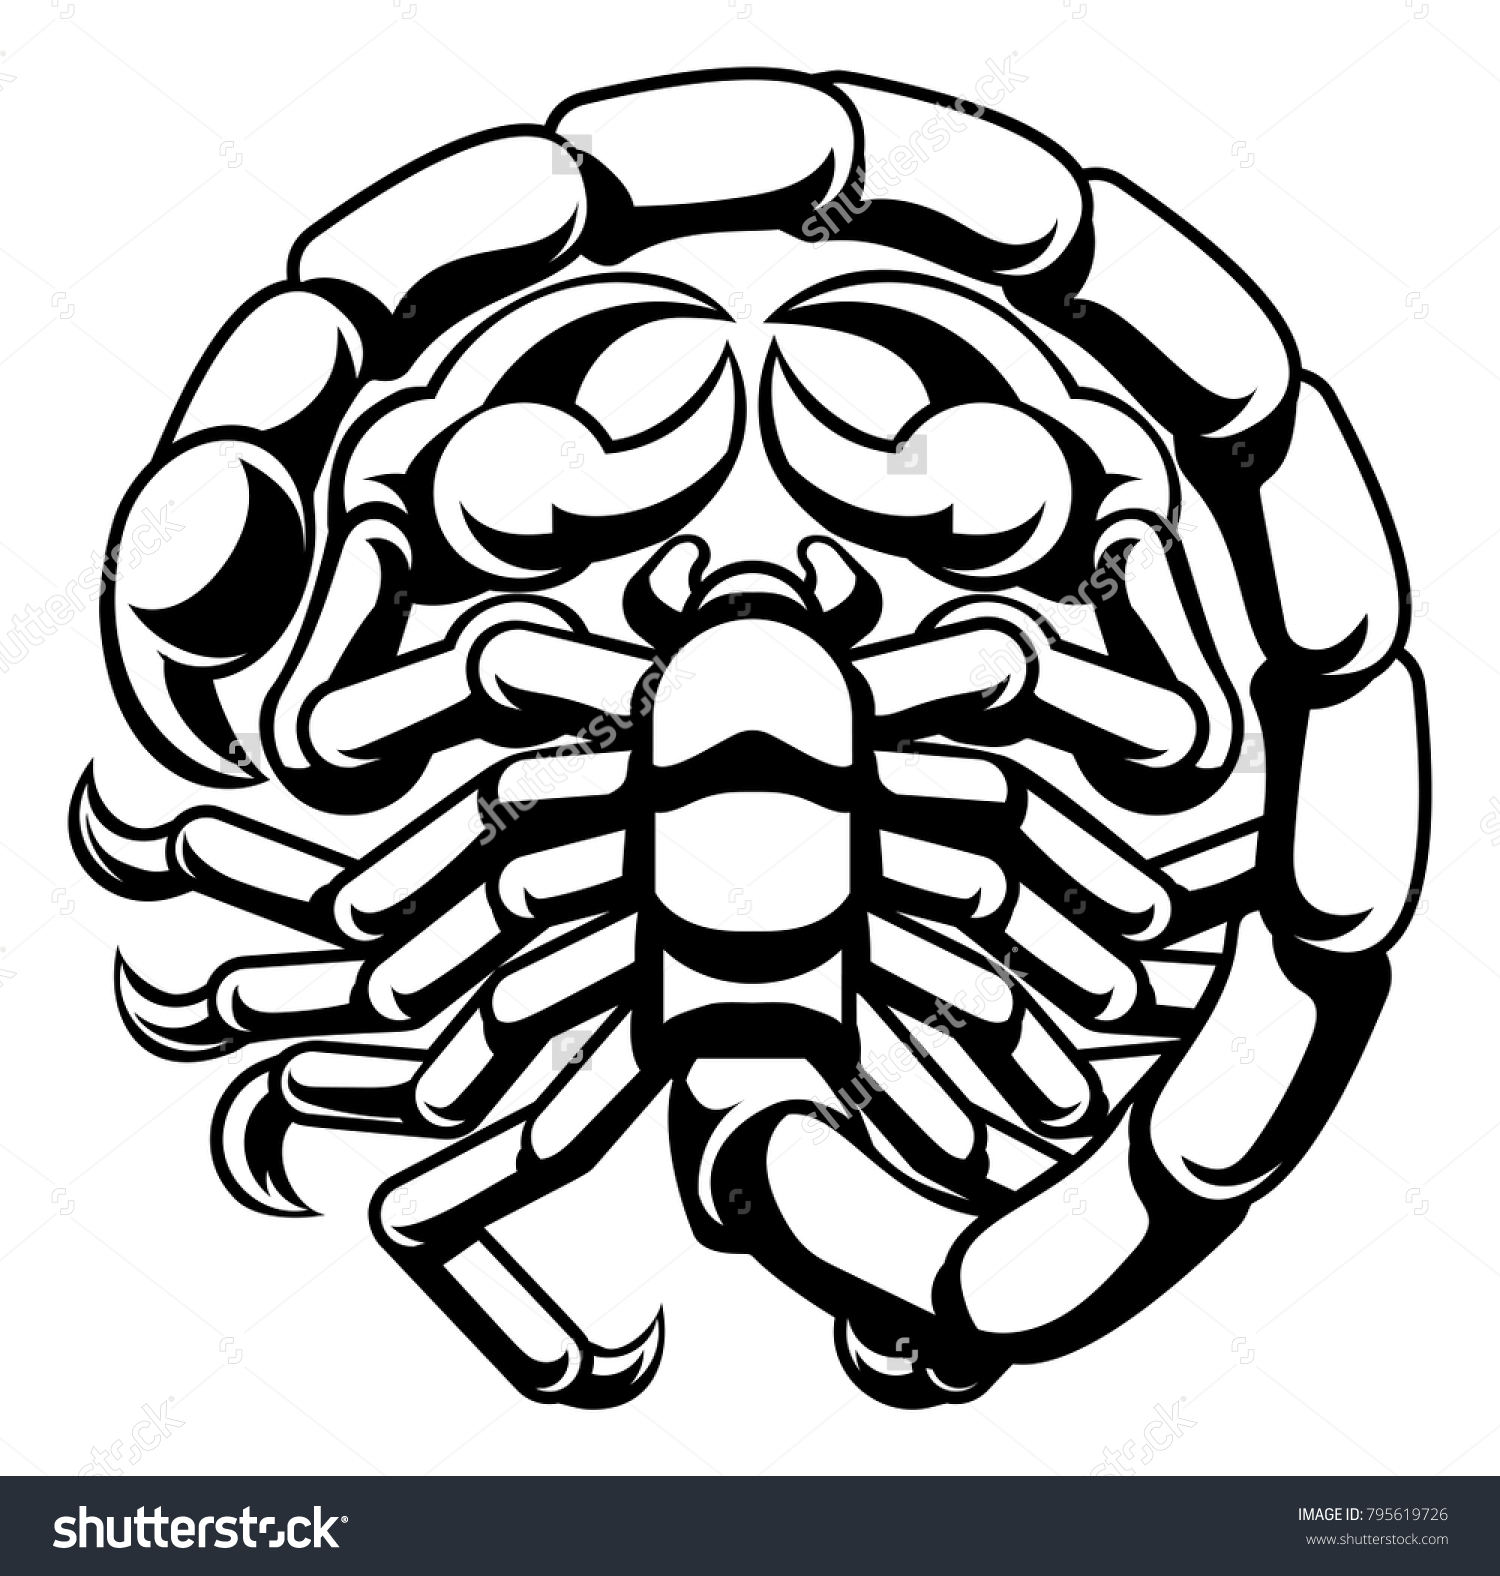 Scorpio scorpion horoscope astrology zodiac sign stock vector scorpio scorpion horoscope astrology zodiac sign symbol buycottarizona Image collections